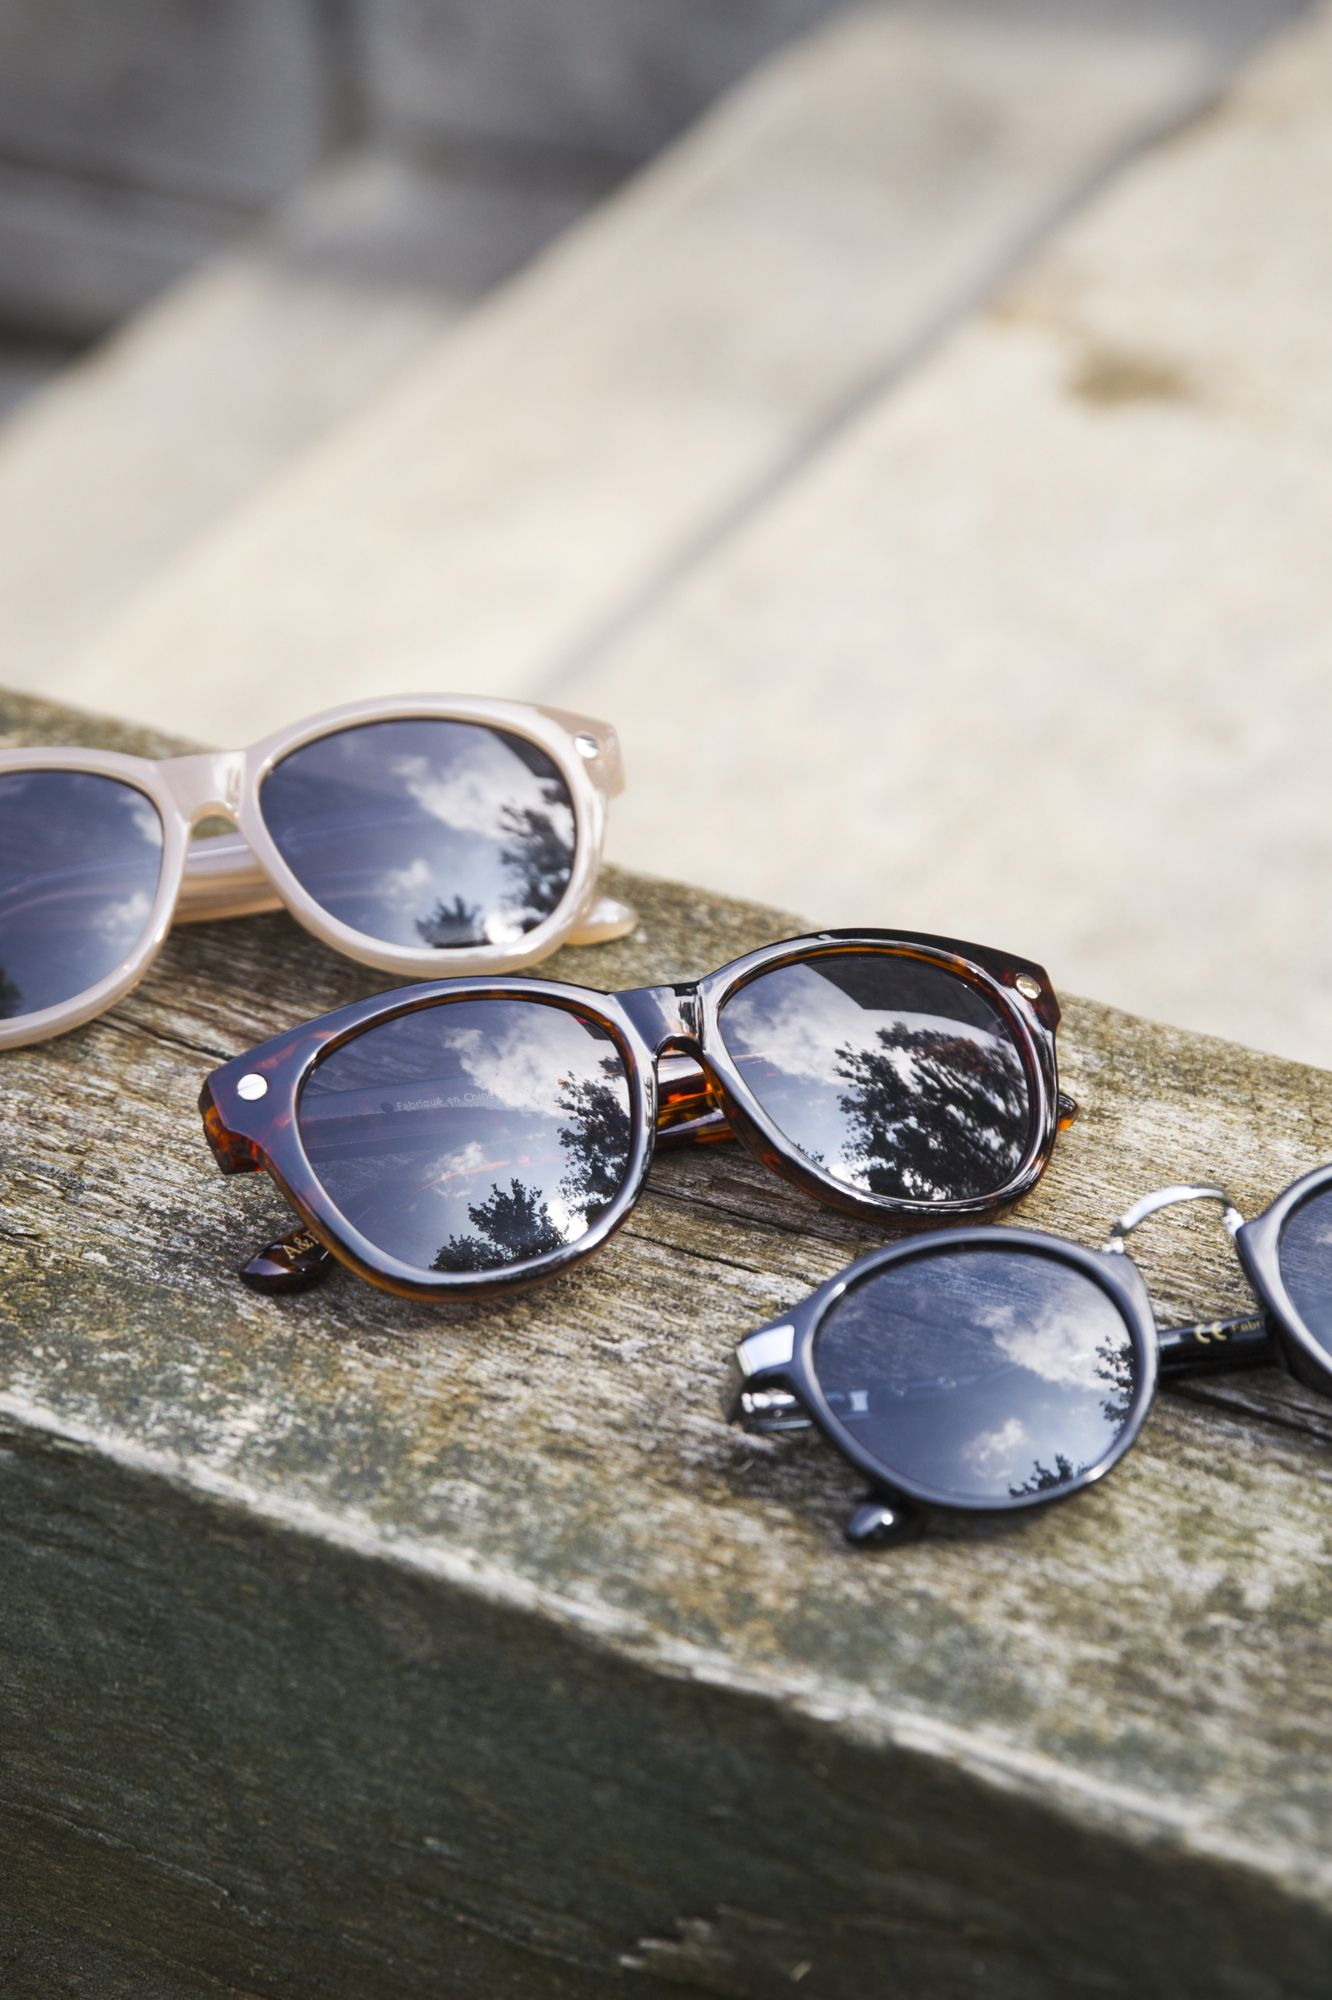 T Fitch L Y ESunglassesFashion Abercrombieamp; SunglassesS TlXZkwOPiu